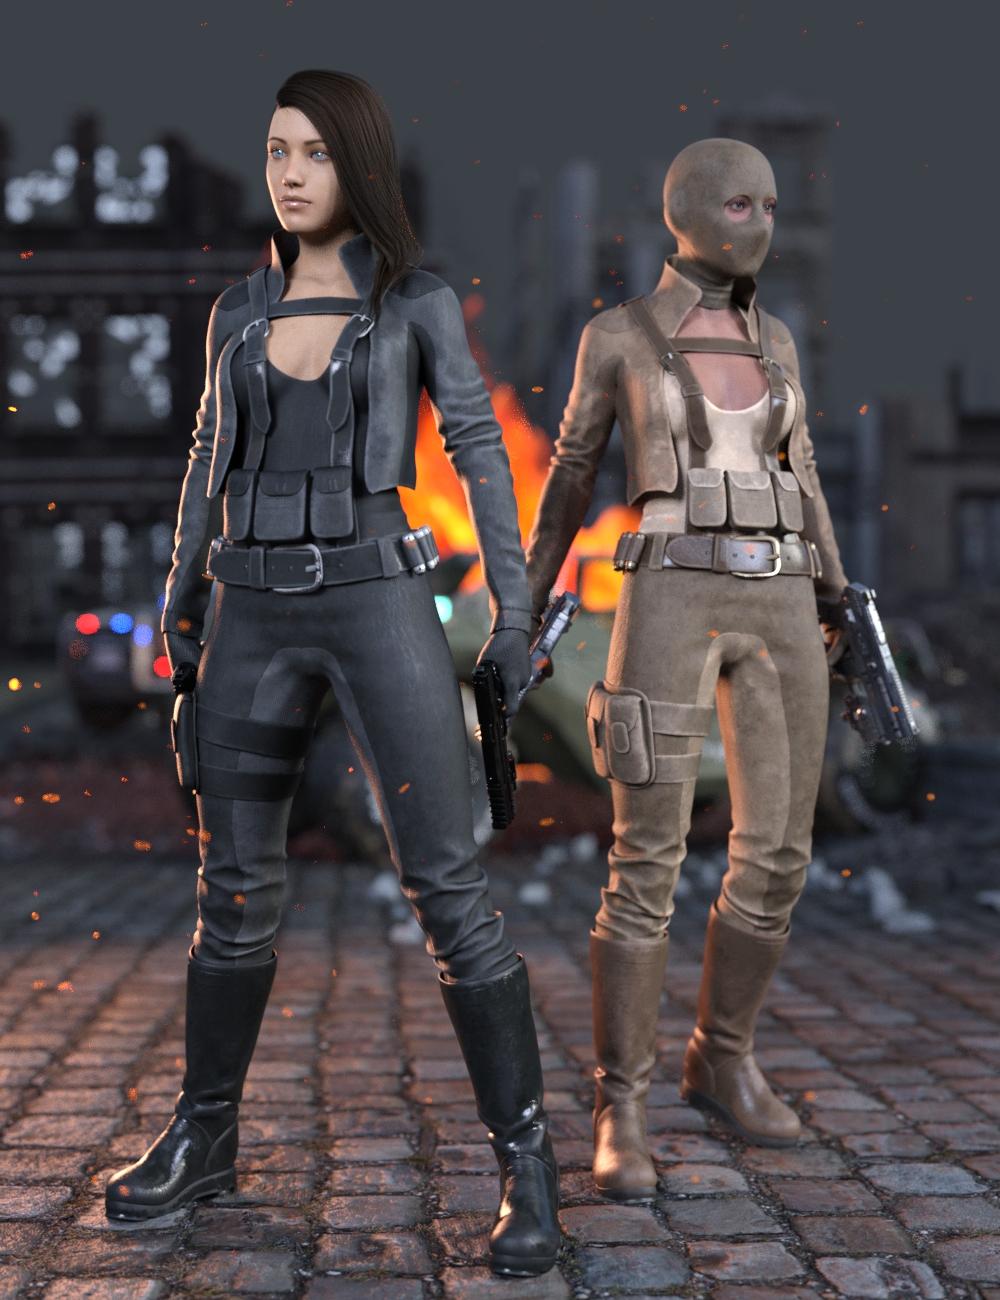 Rebel Militia Outfit for Genesis 8.1 Females by: Yura, 3D Models by Daz 3D